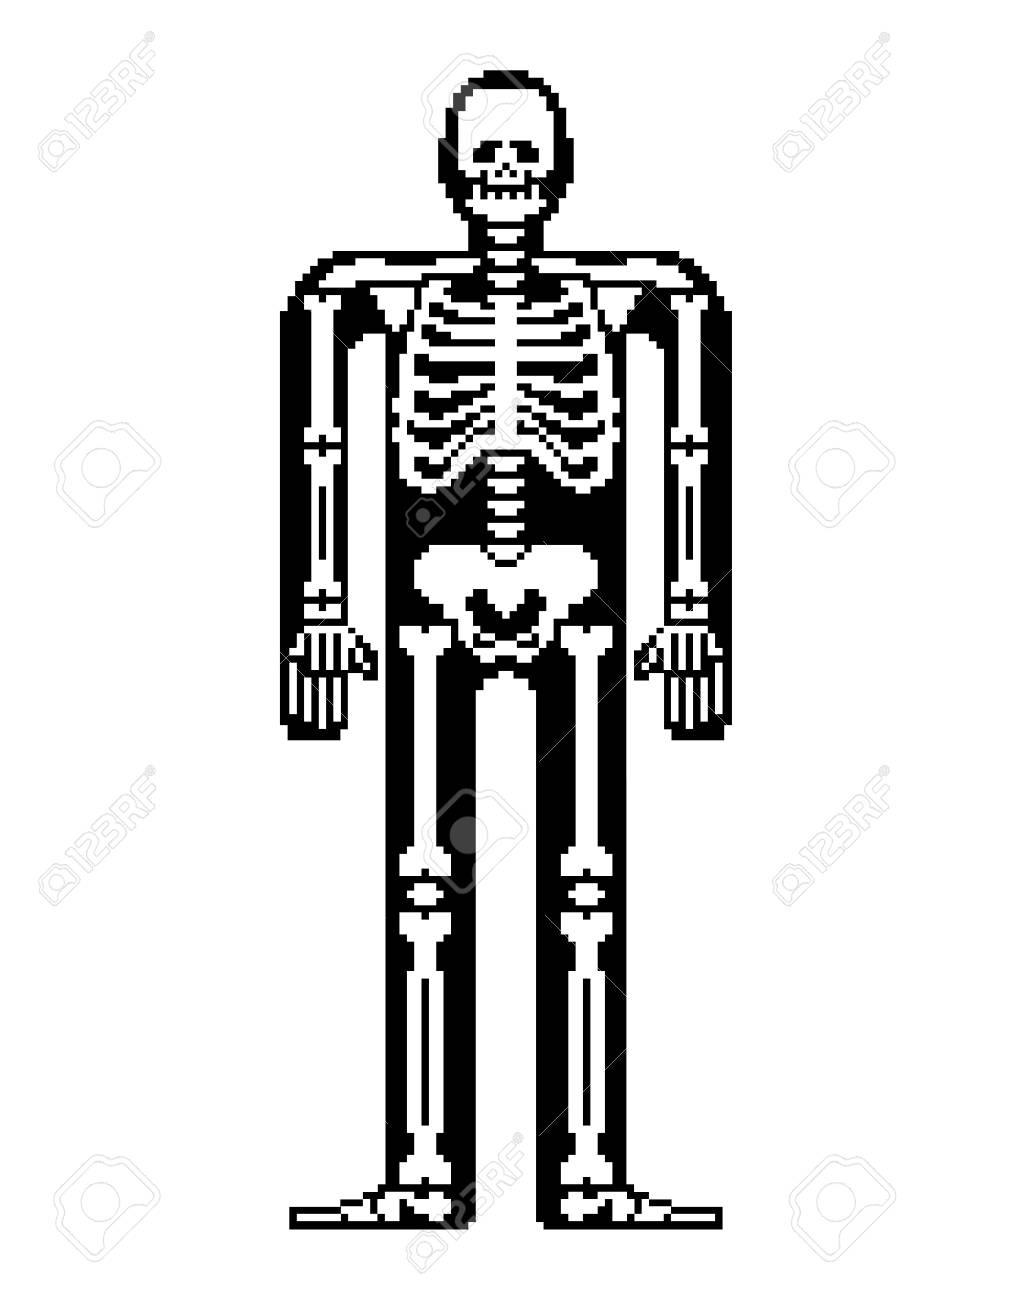 Skeleton Pixel Art Skull And Bones Anatomy 8 Bit Pixelate Pelvic